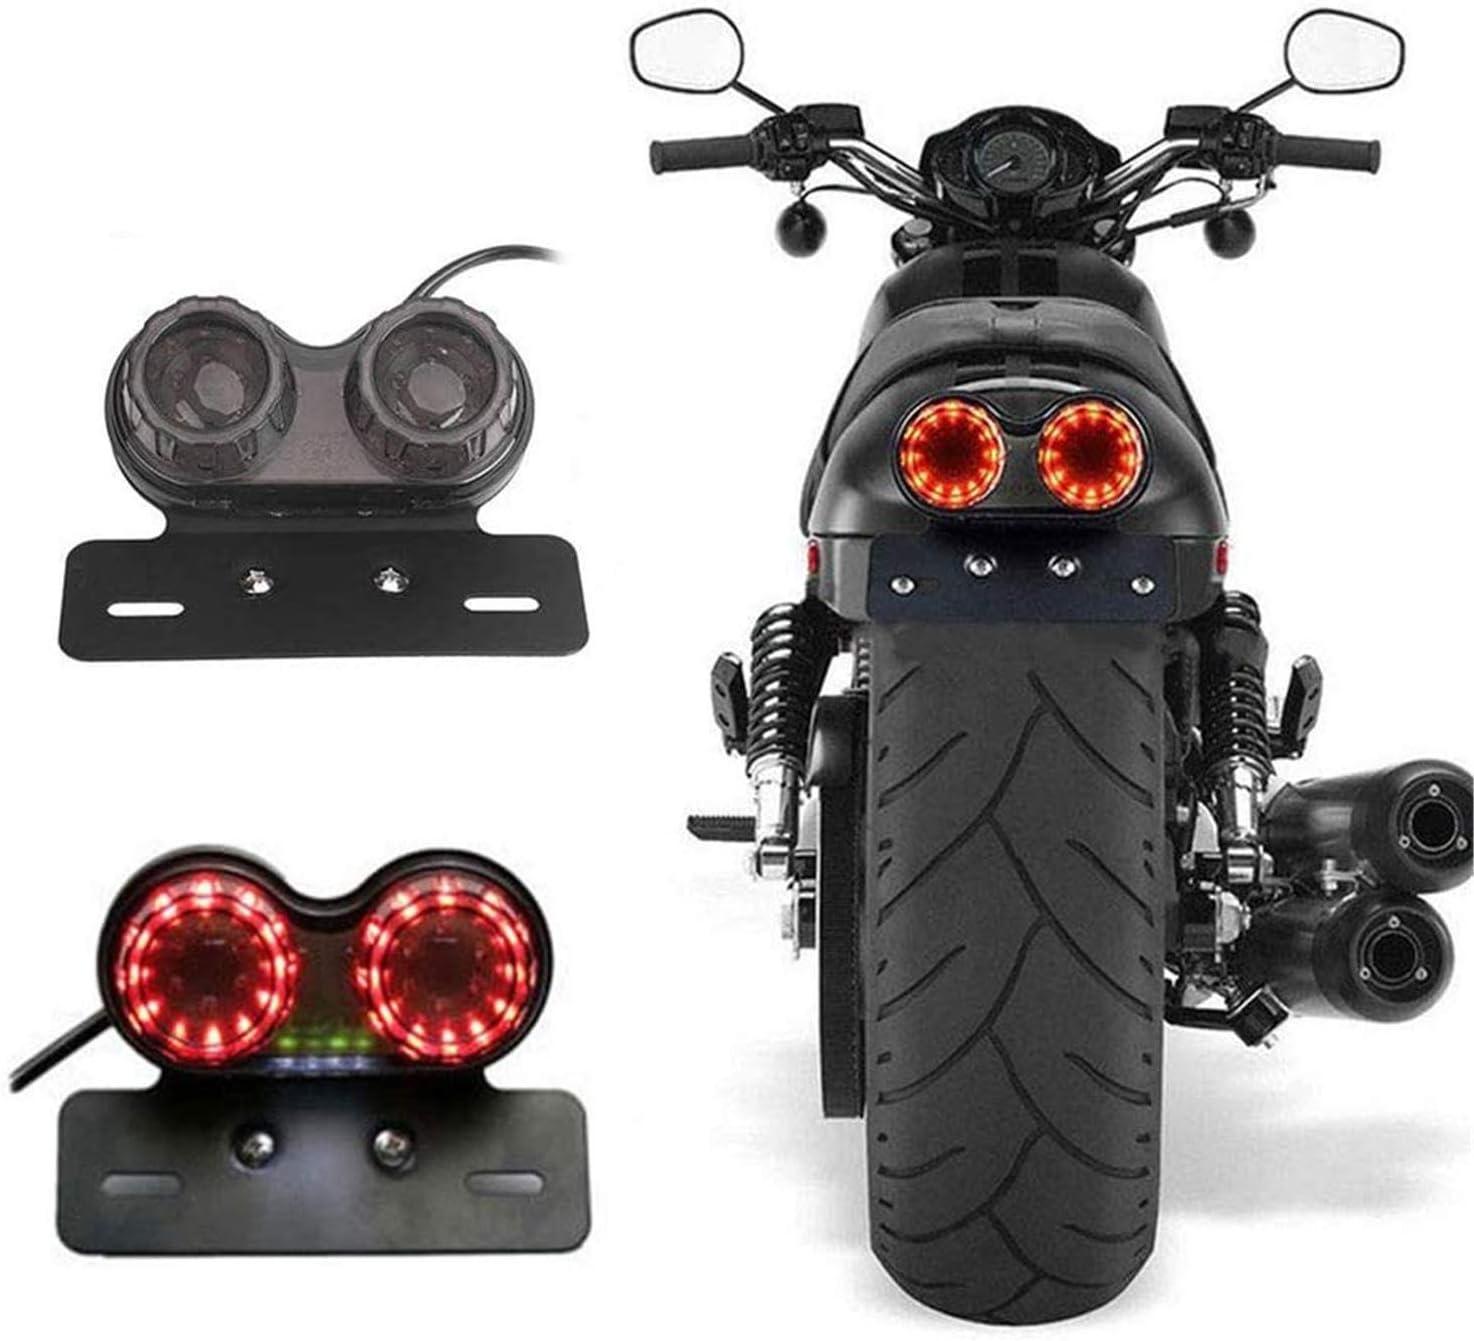 Chudan 12v Led Rücklicht Generic Durable Motorrad Light Blinkerbremse Dual Light Twin Light Integrated Sport Freizeit